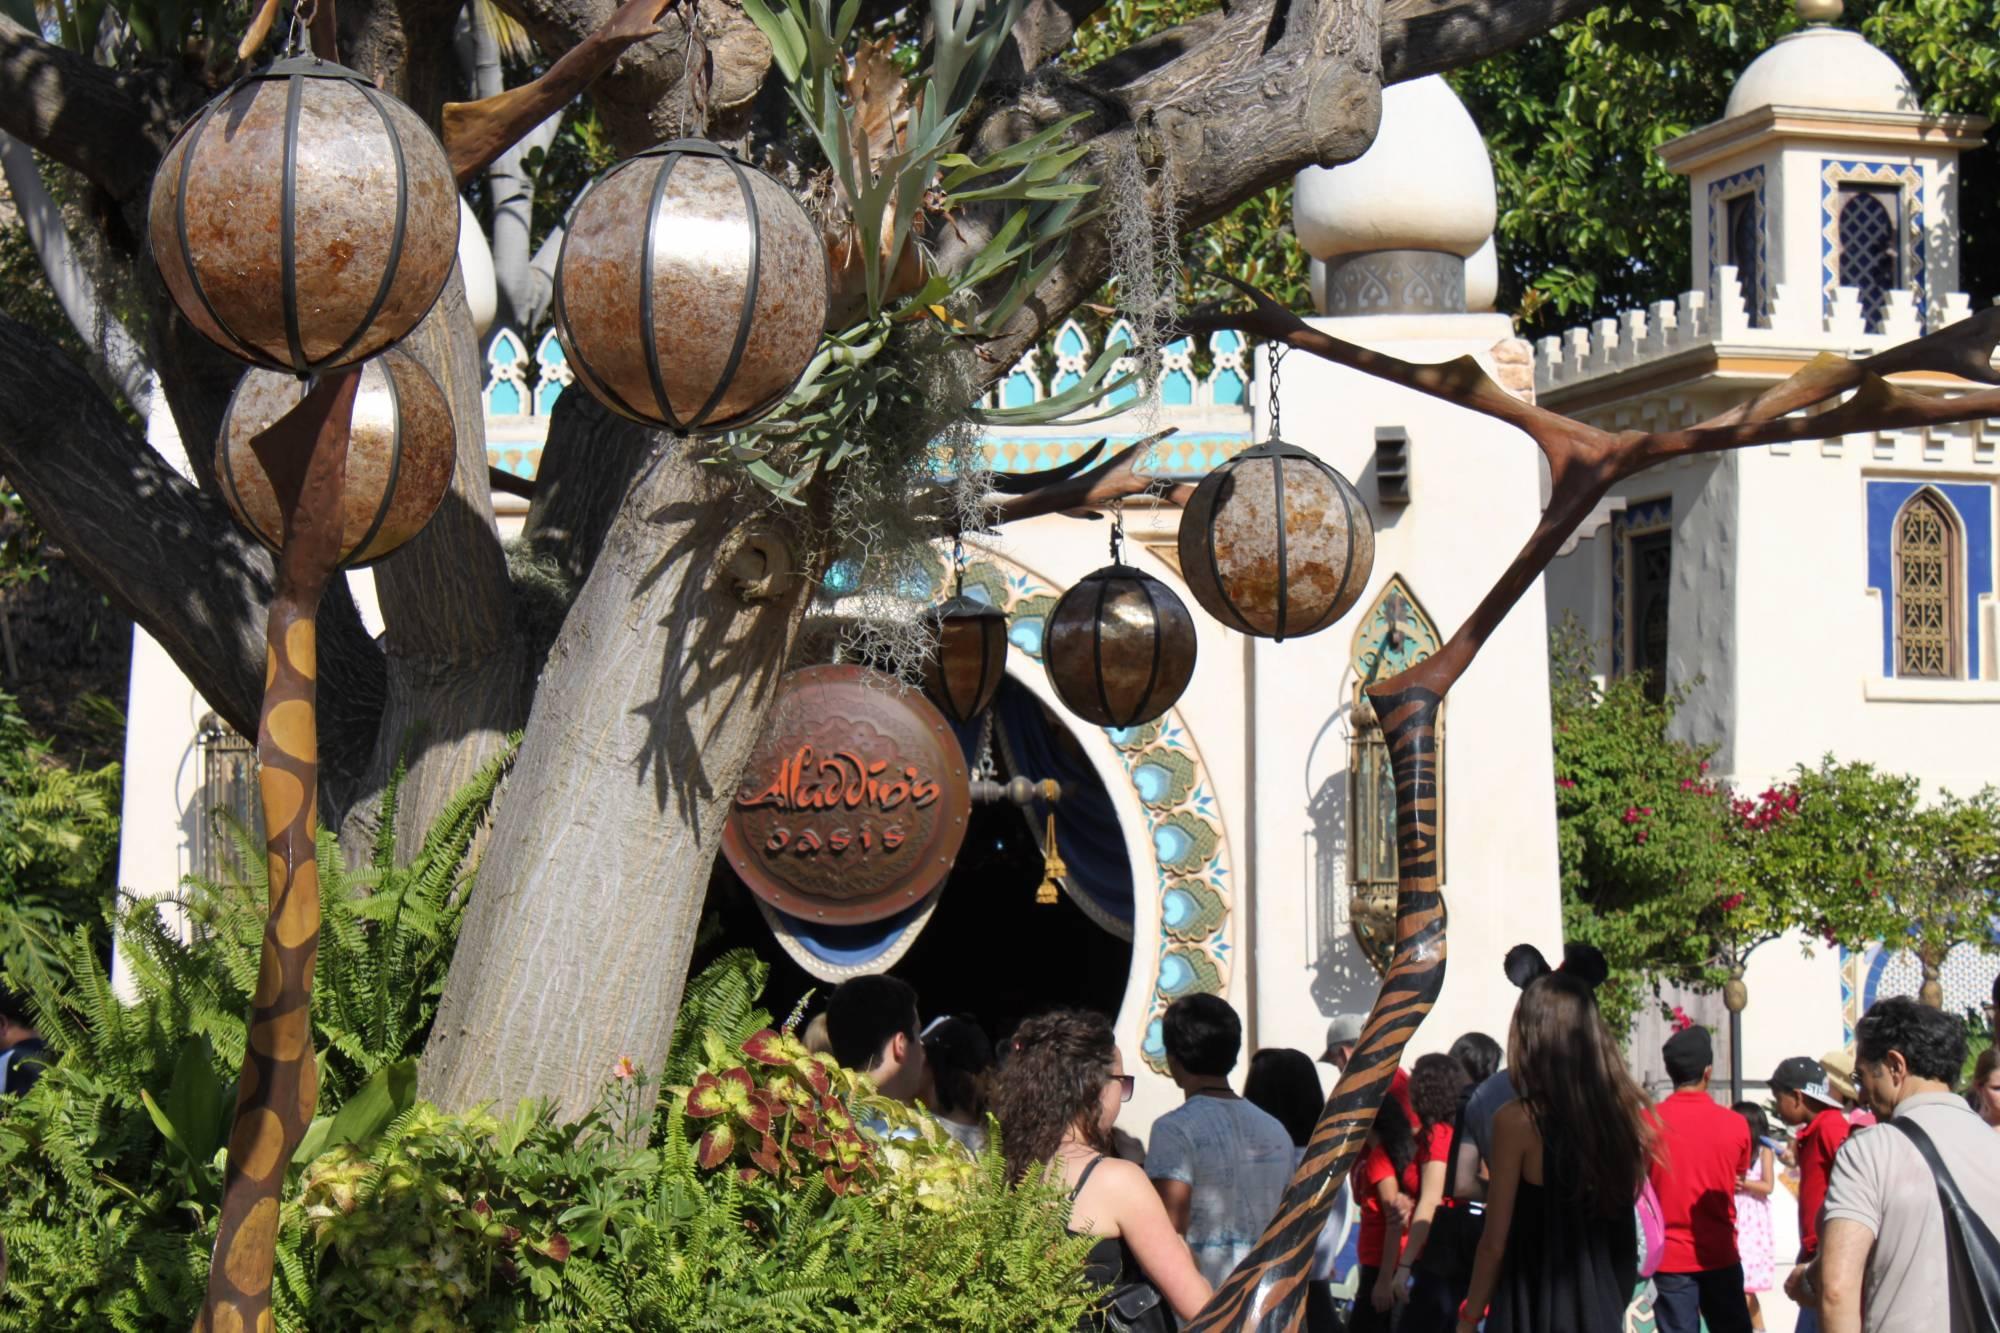 Disneyland - Adventureland - Aladdin's Oasis meet & greet